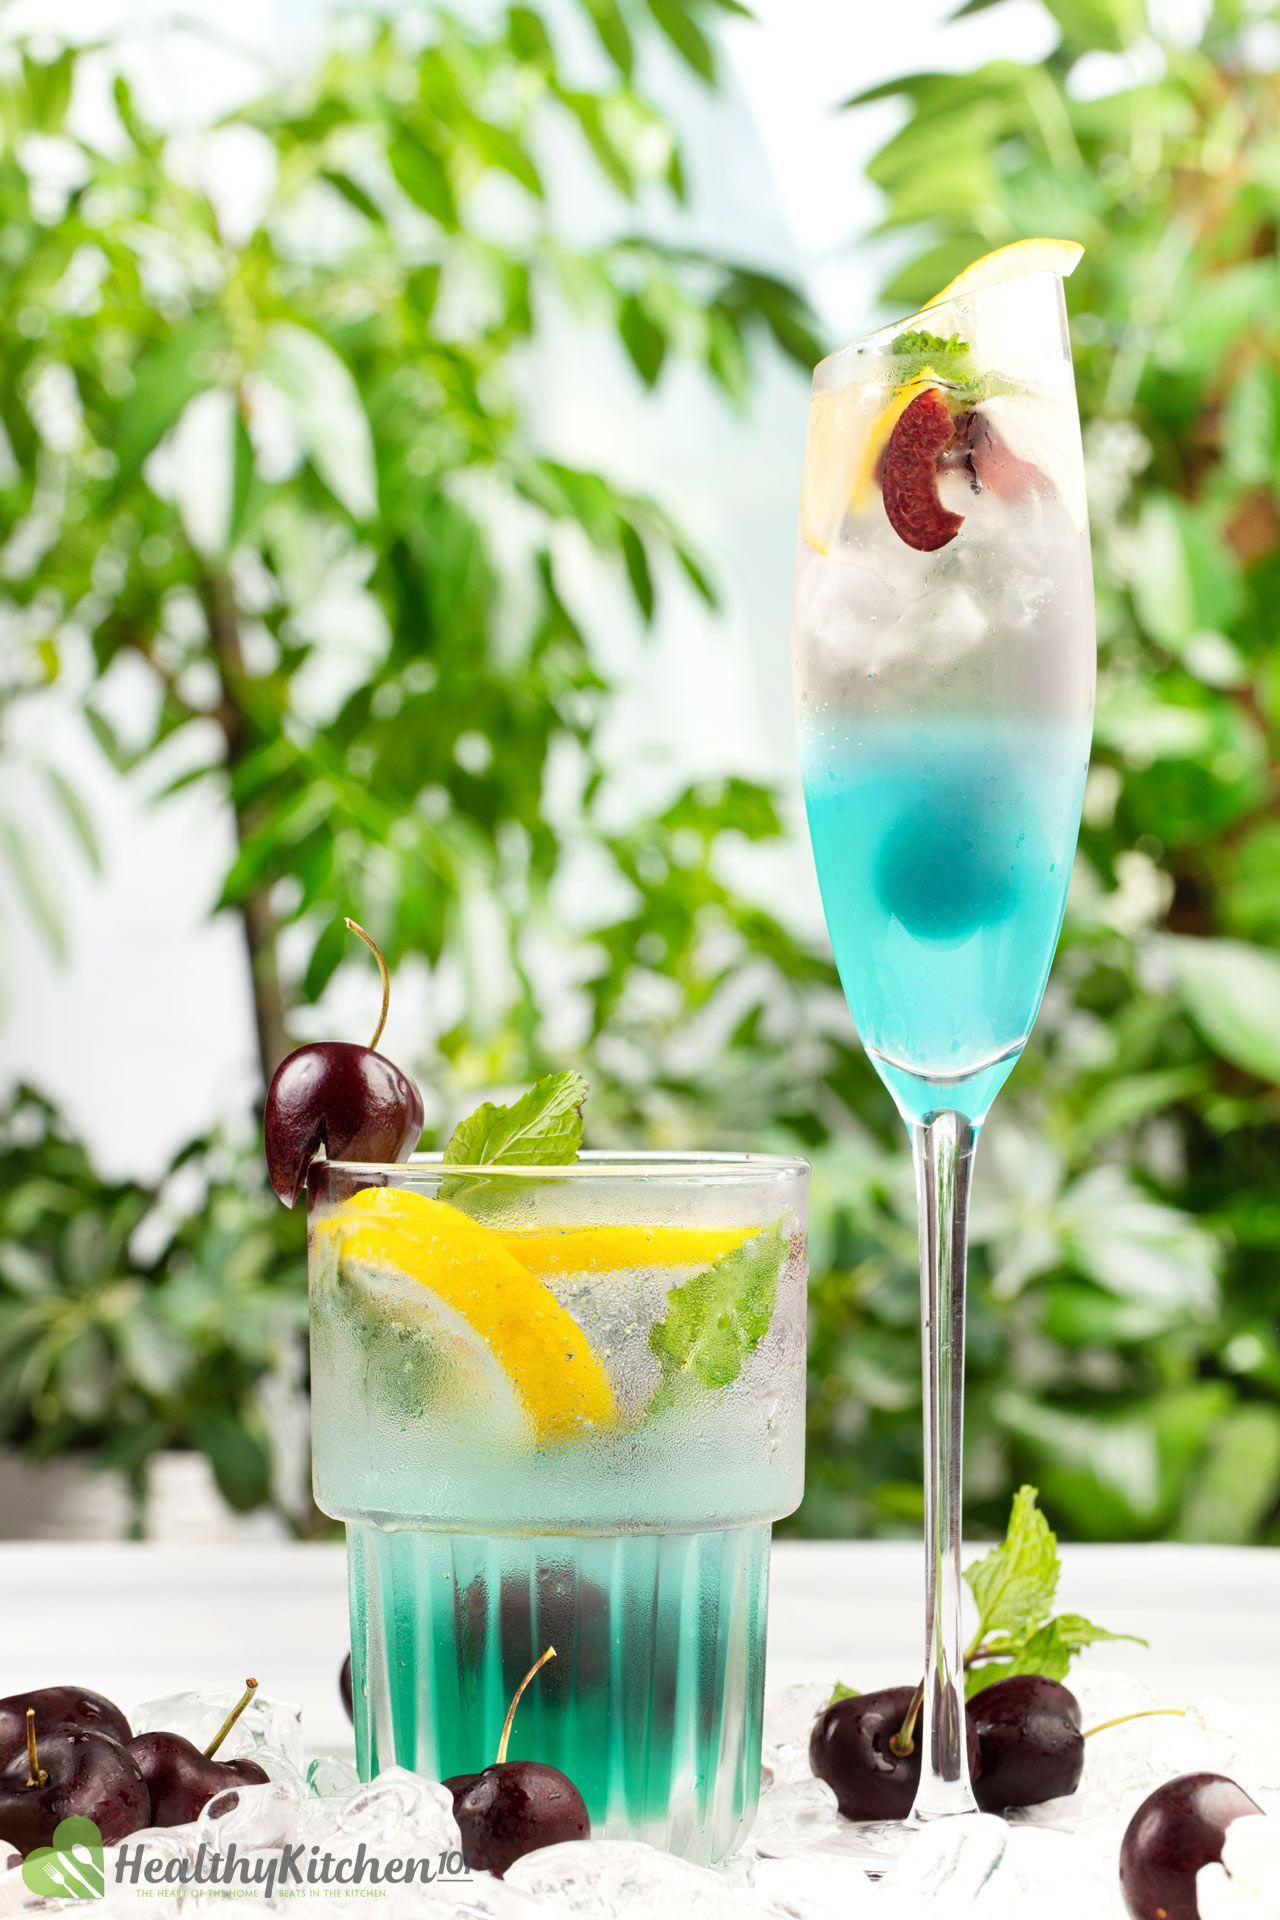 Homemade Blue Jungle Juice